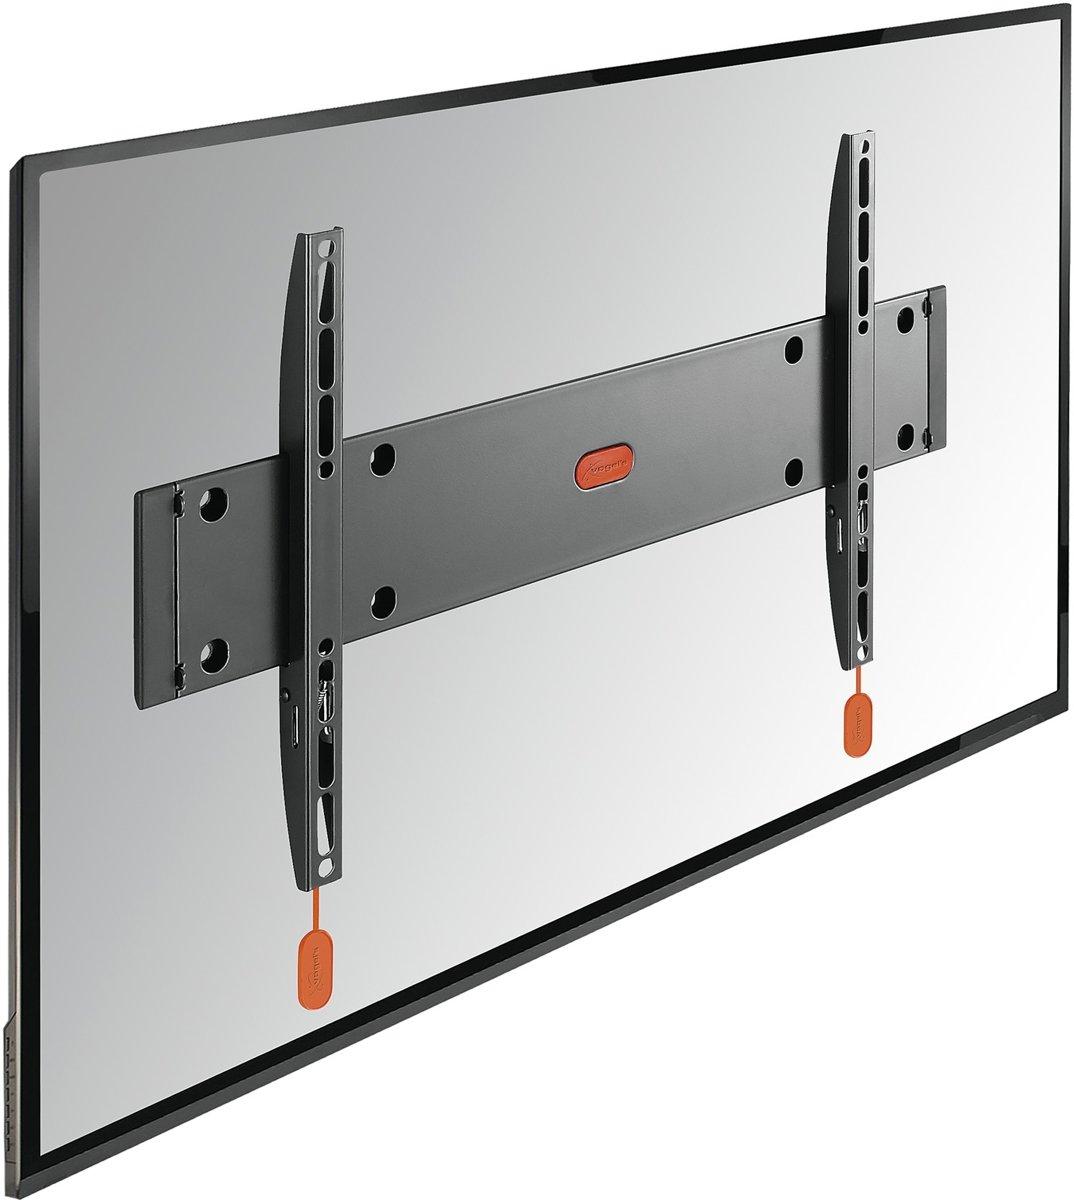 Voorkeur bol.com   TV beugel kopen? Alle TV beugels online VV28